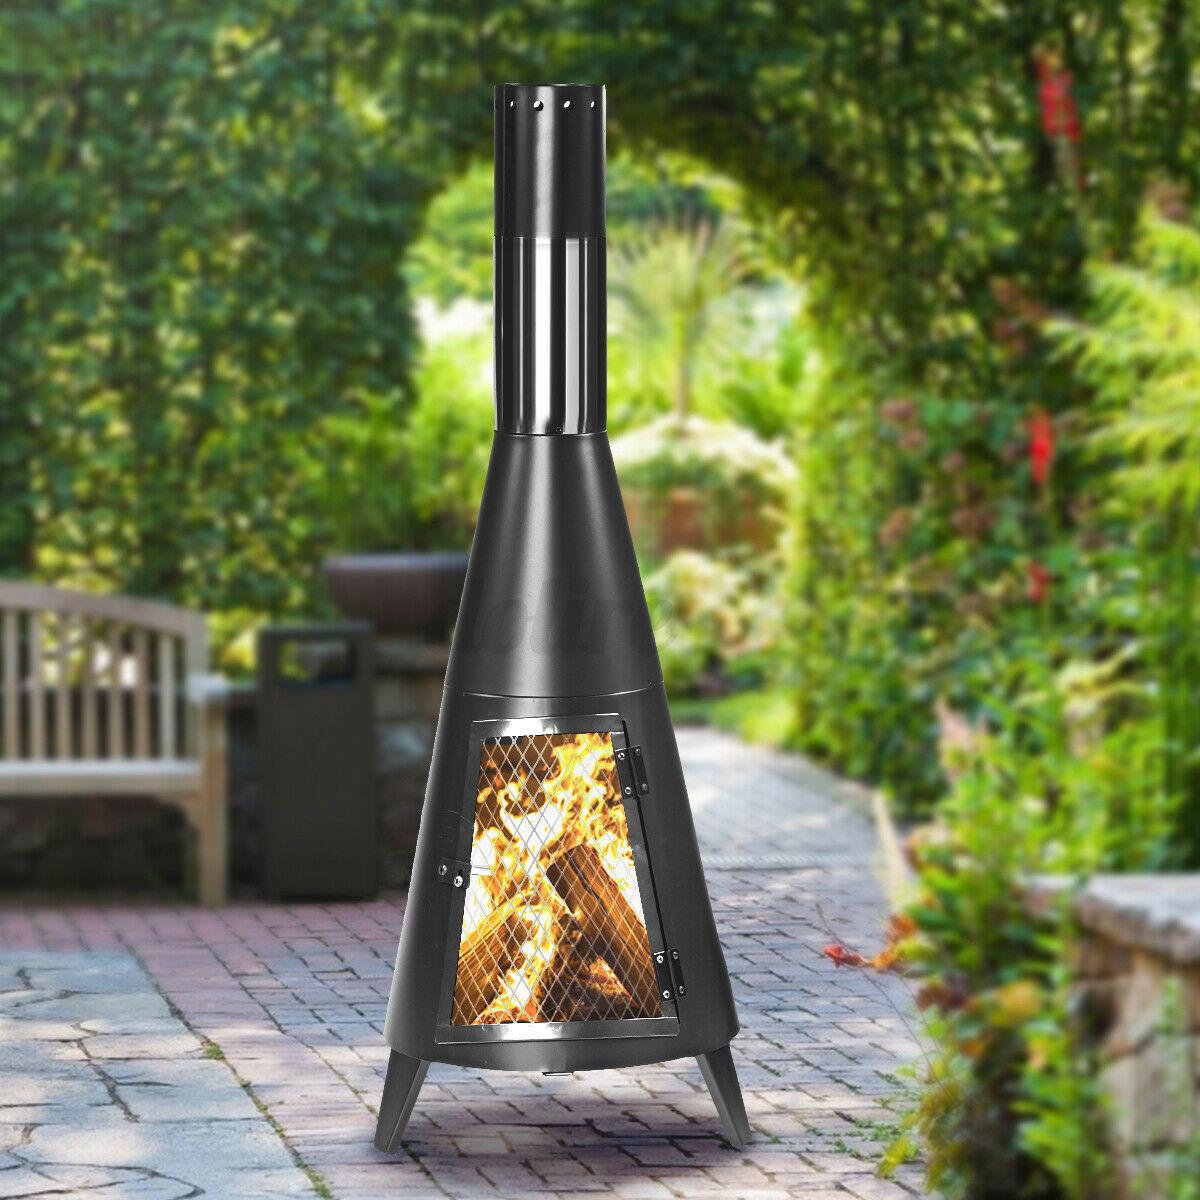 outdoor wood burning fireplace chimenea